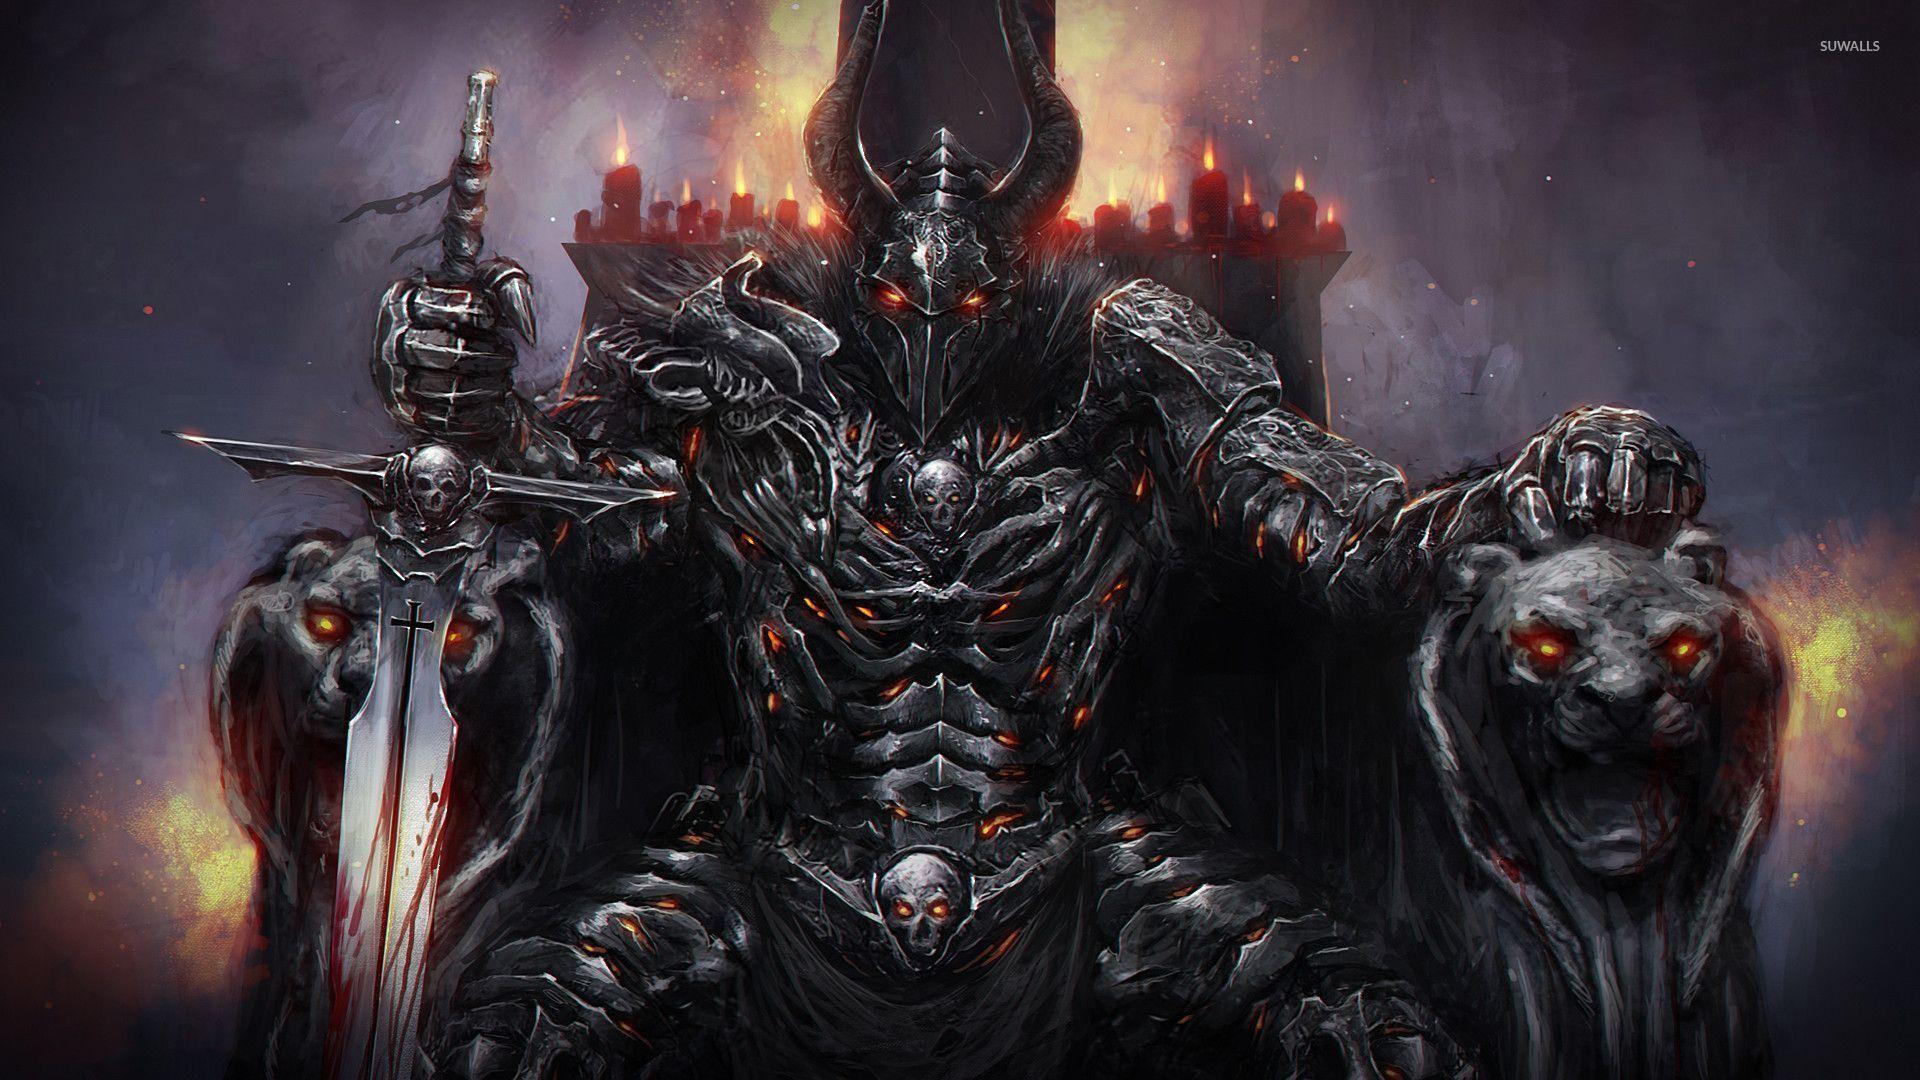 Demon King Wallpapers Wallpaper Cave